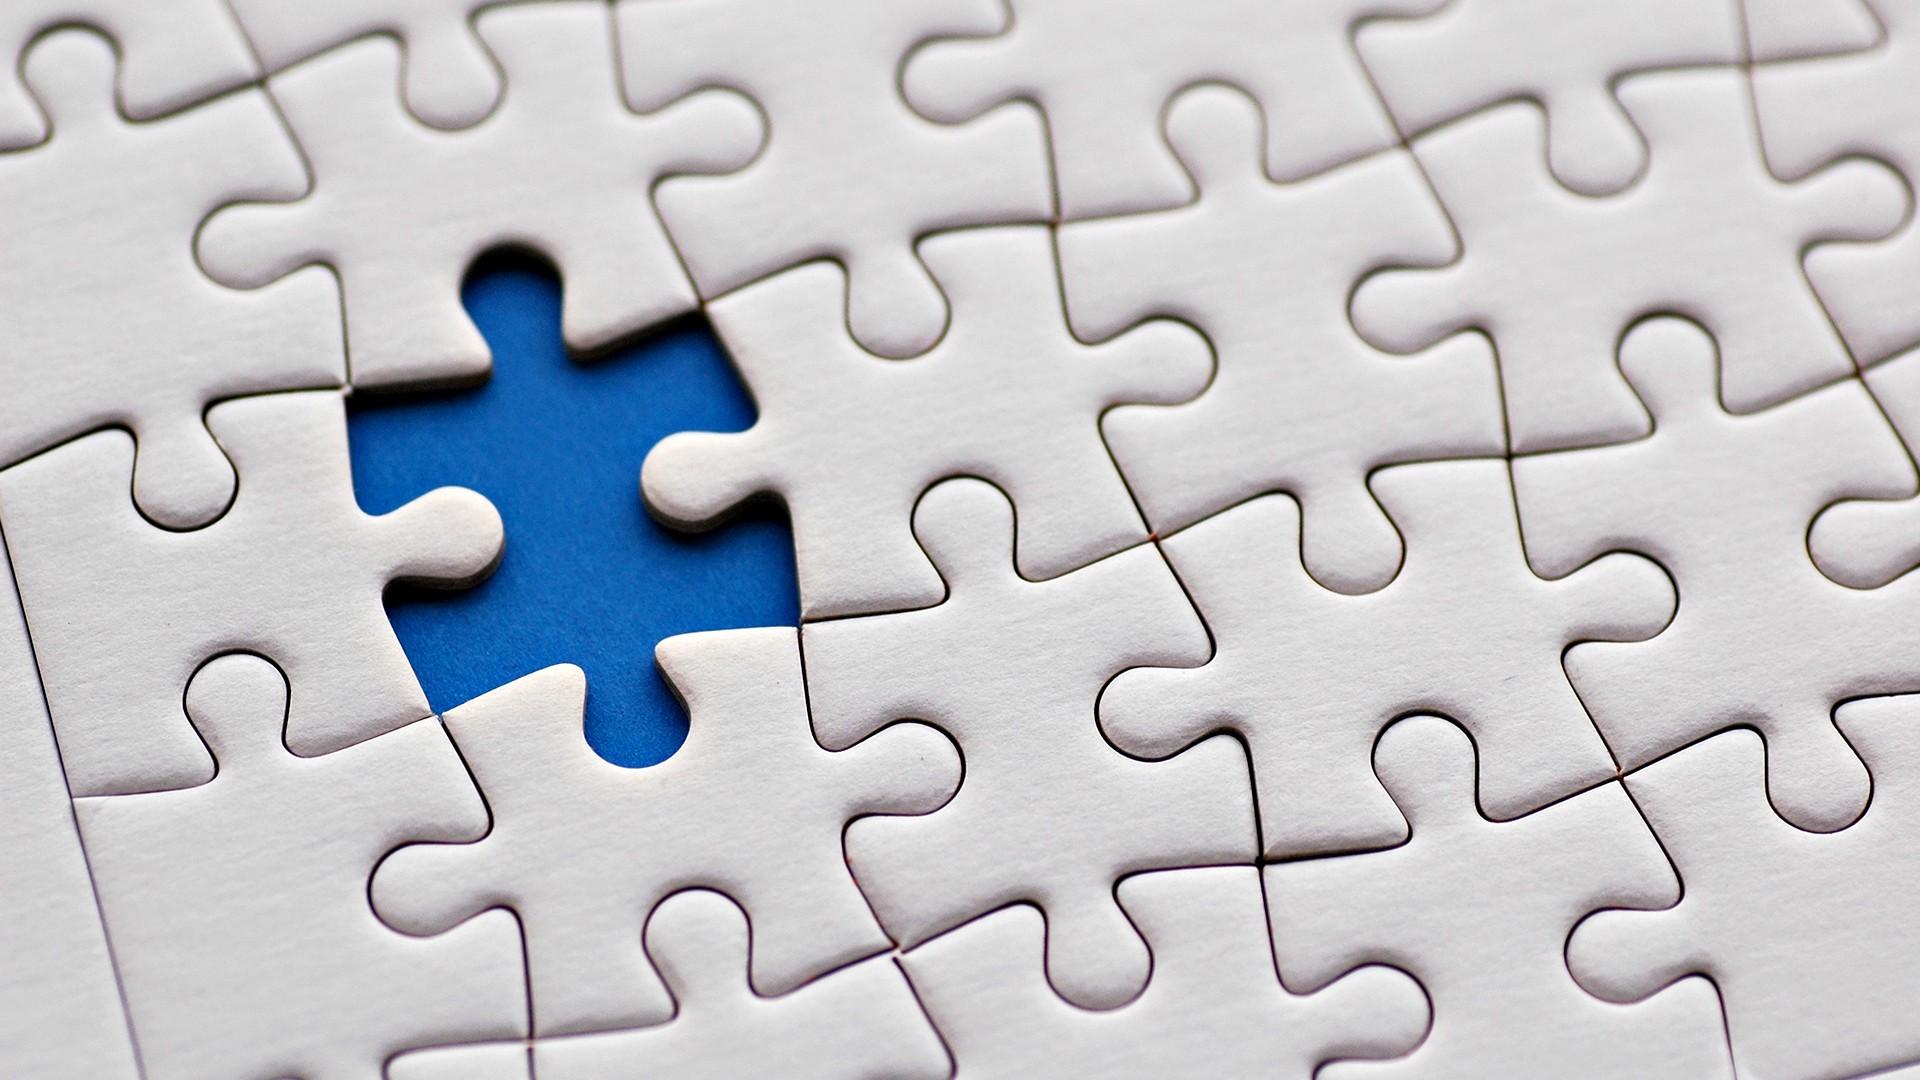 Puzzle Wallpaper 44758 1920x1080 Px HDWallSource